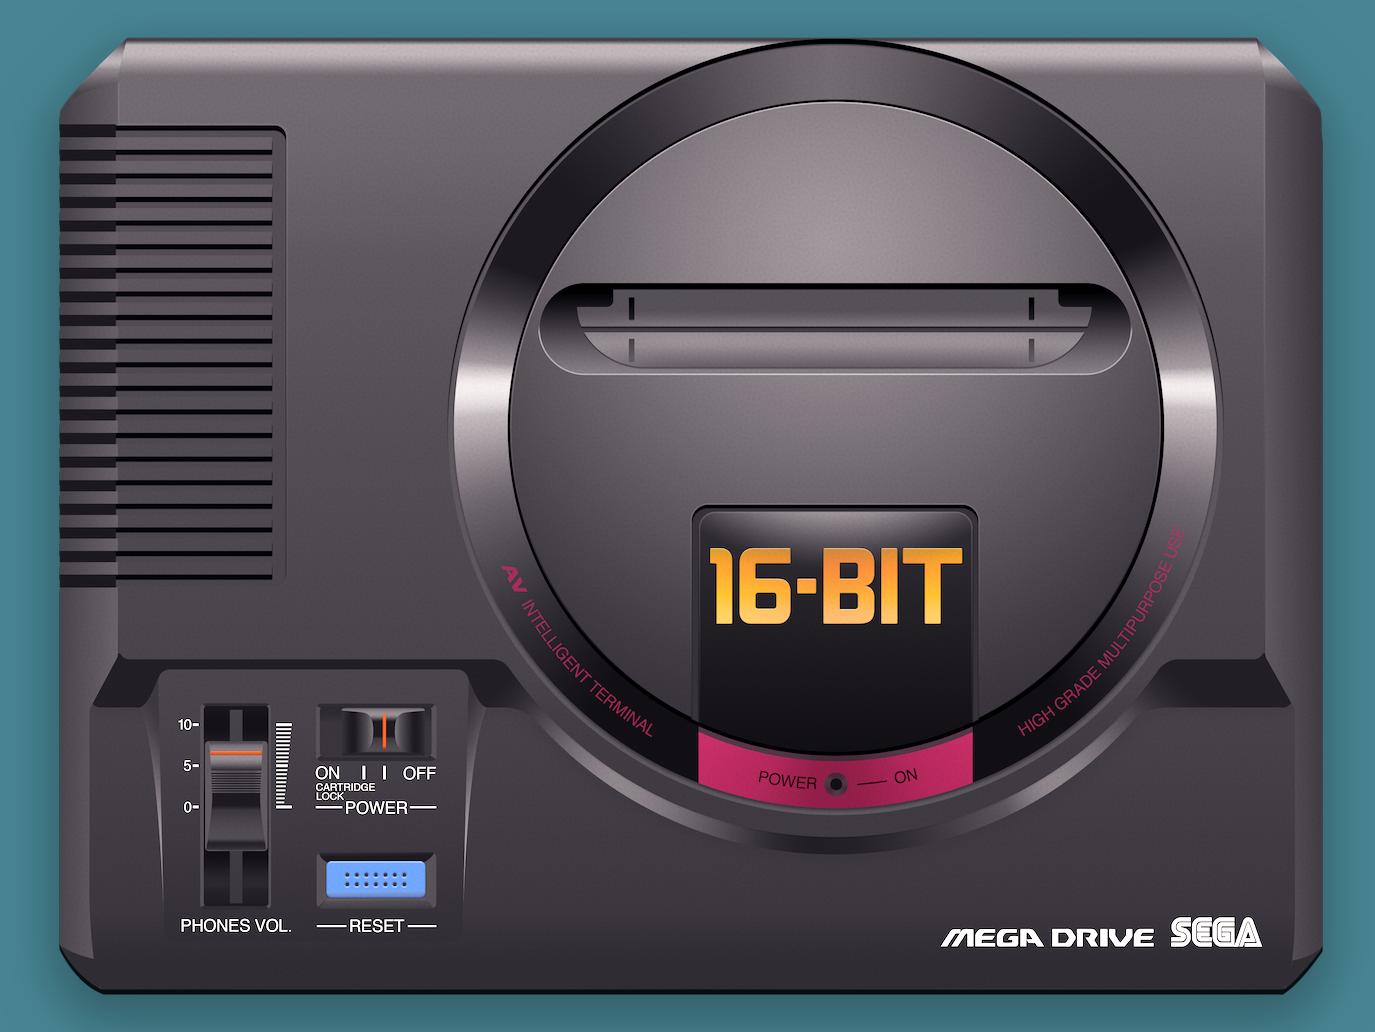 Mega Drive genesis solid audio zilog yamaha sonic videogame game video console vitage 16bit sega japan art design 80s retro photorealistic illustration